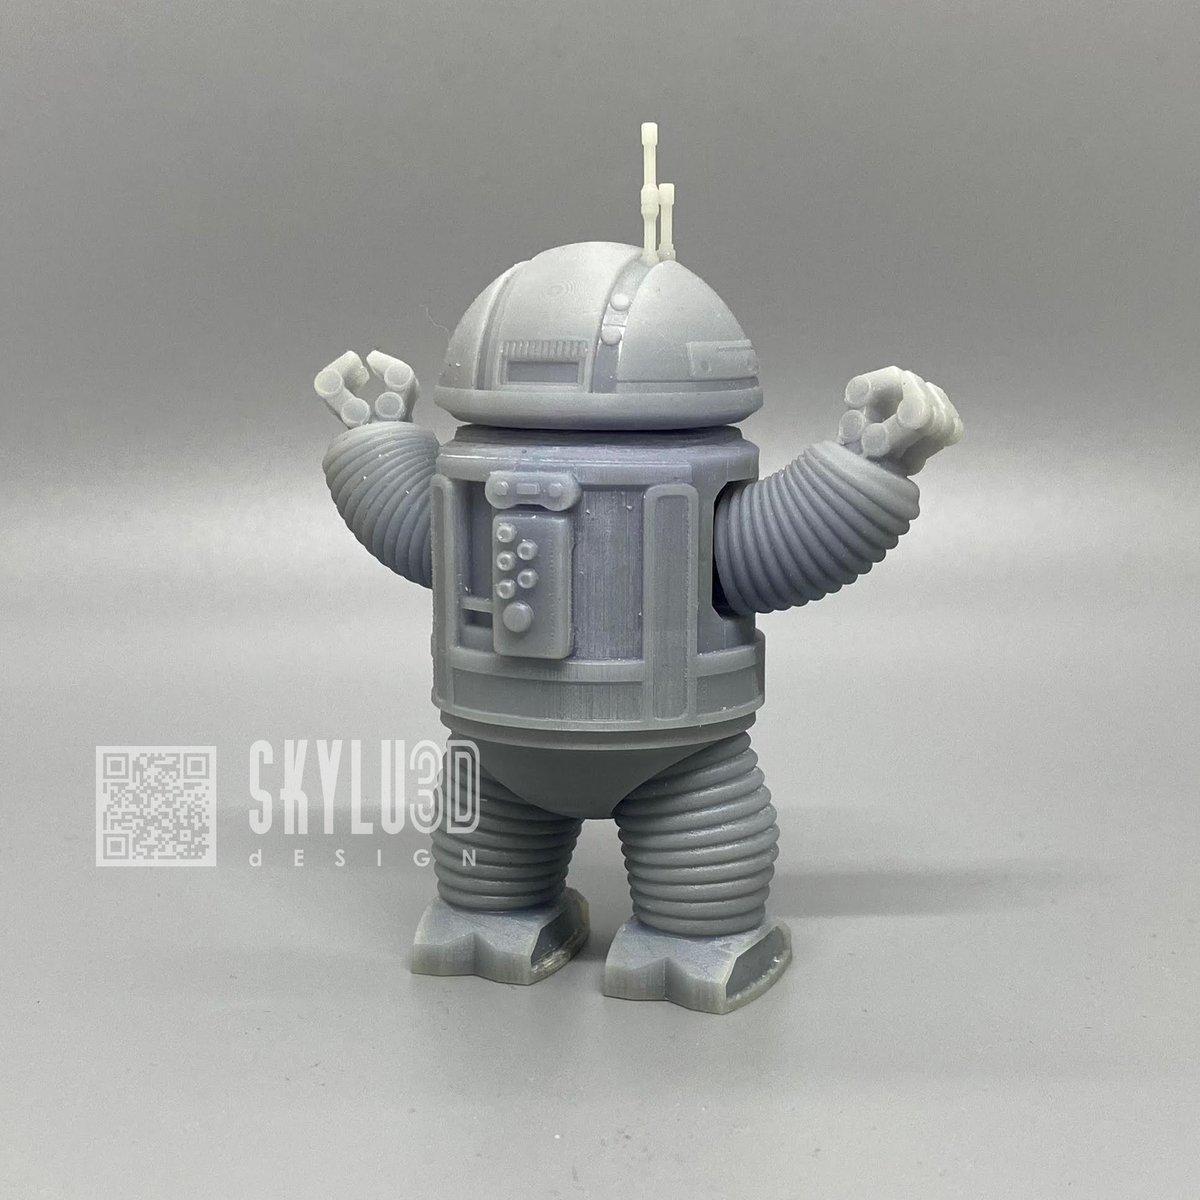 Image of Clink Robot by Skylu3d Design